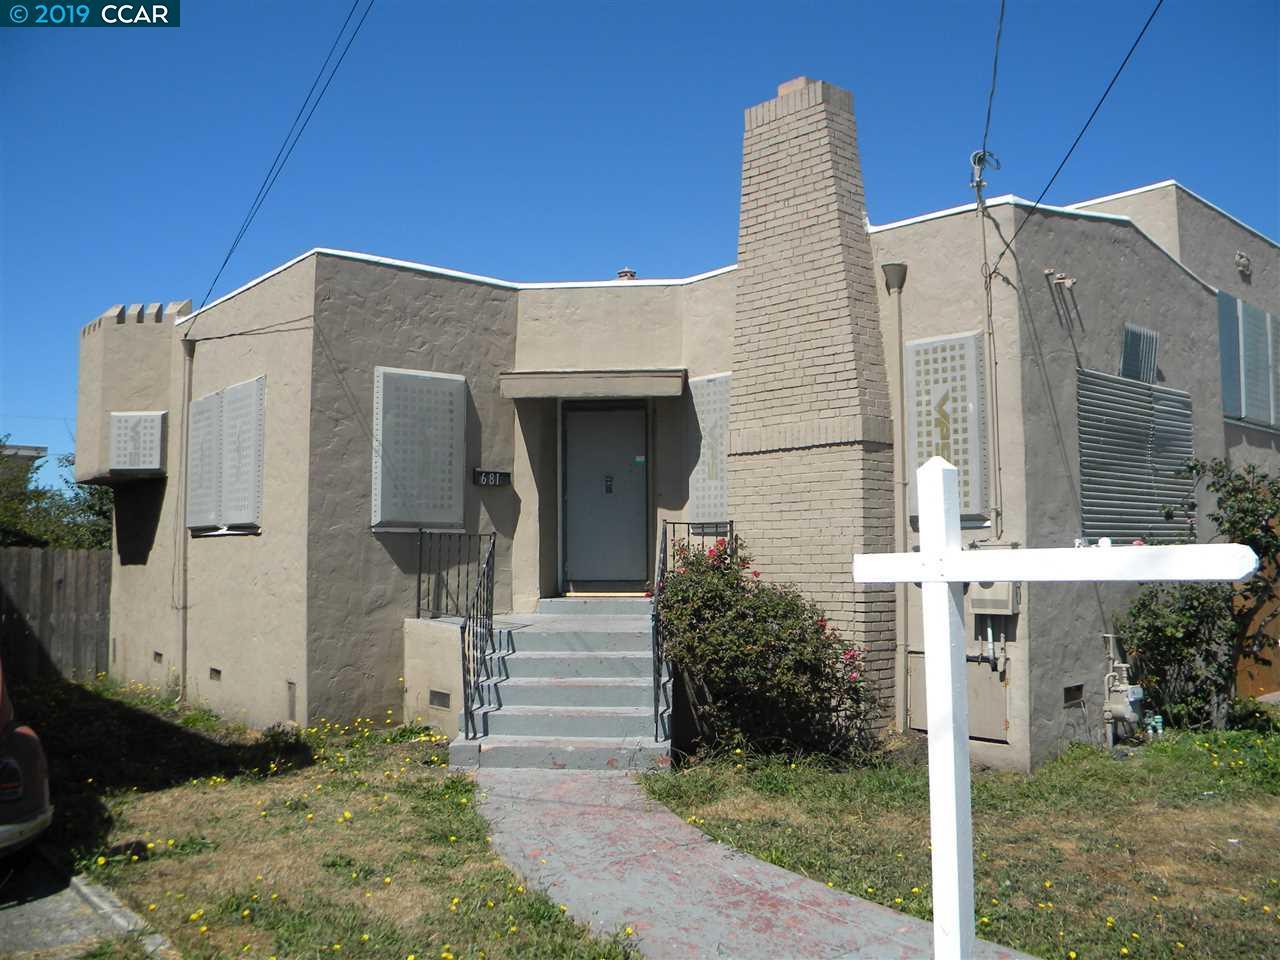 681 11TH ST, RICHMOND, CA 94801